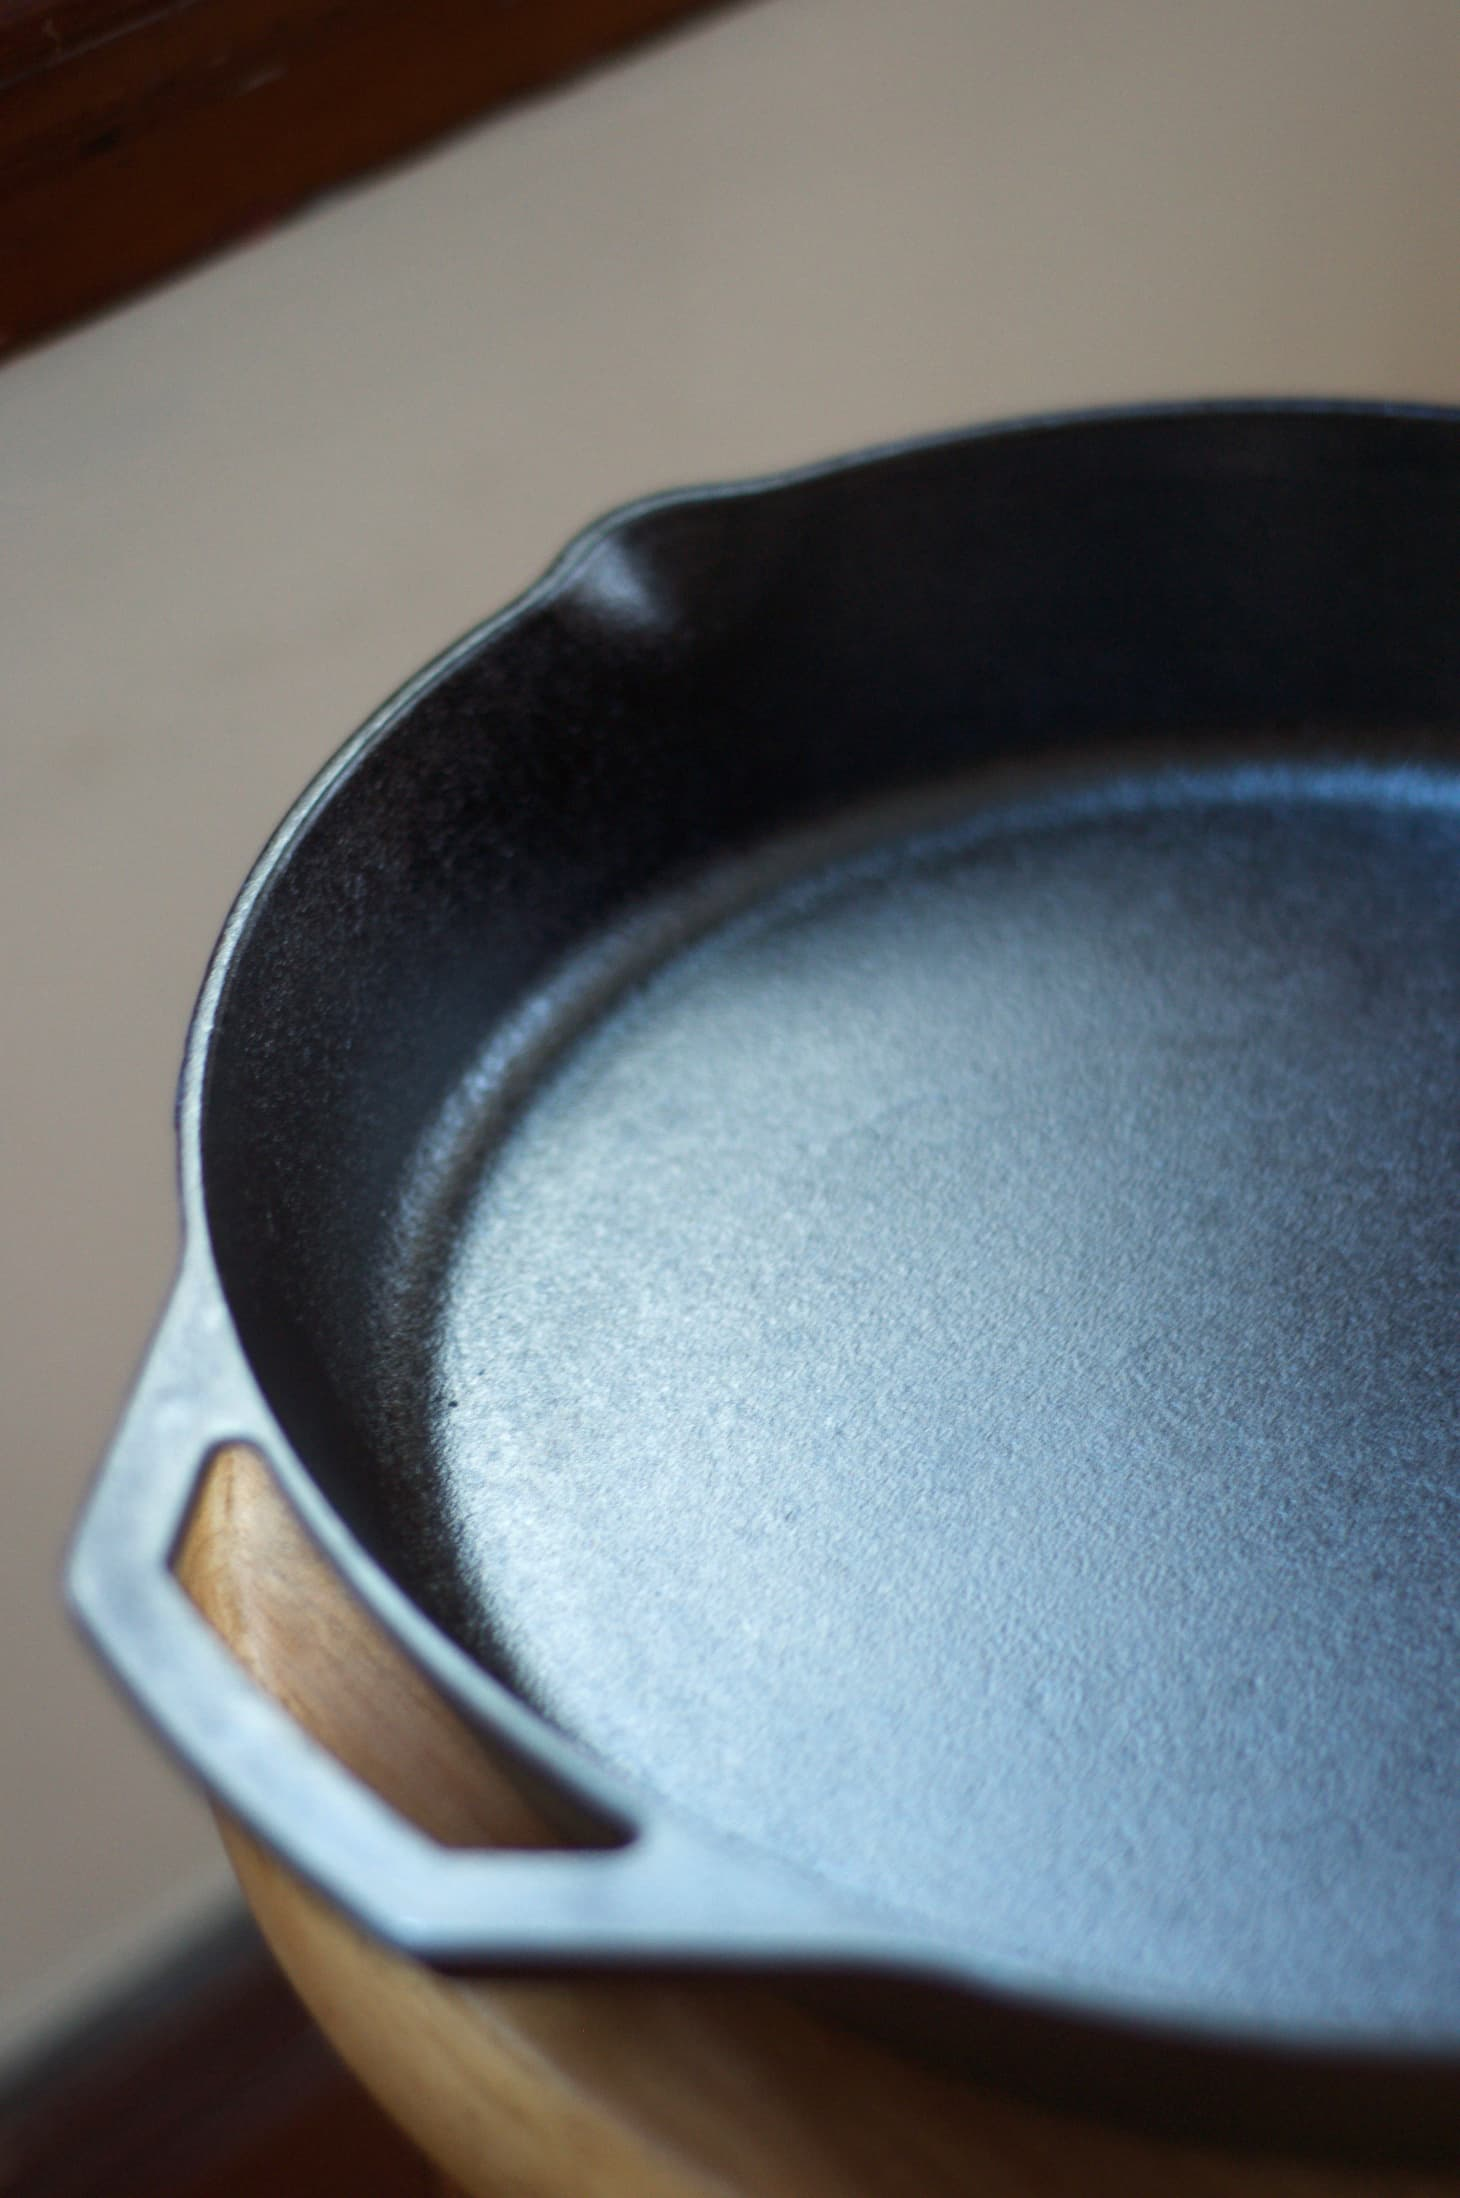 Season Cast Iron Skillet Flaxseed Oil | Kitchn